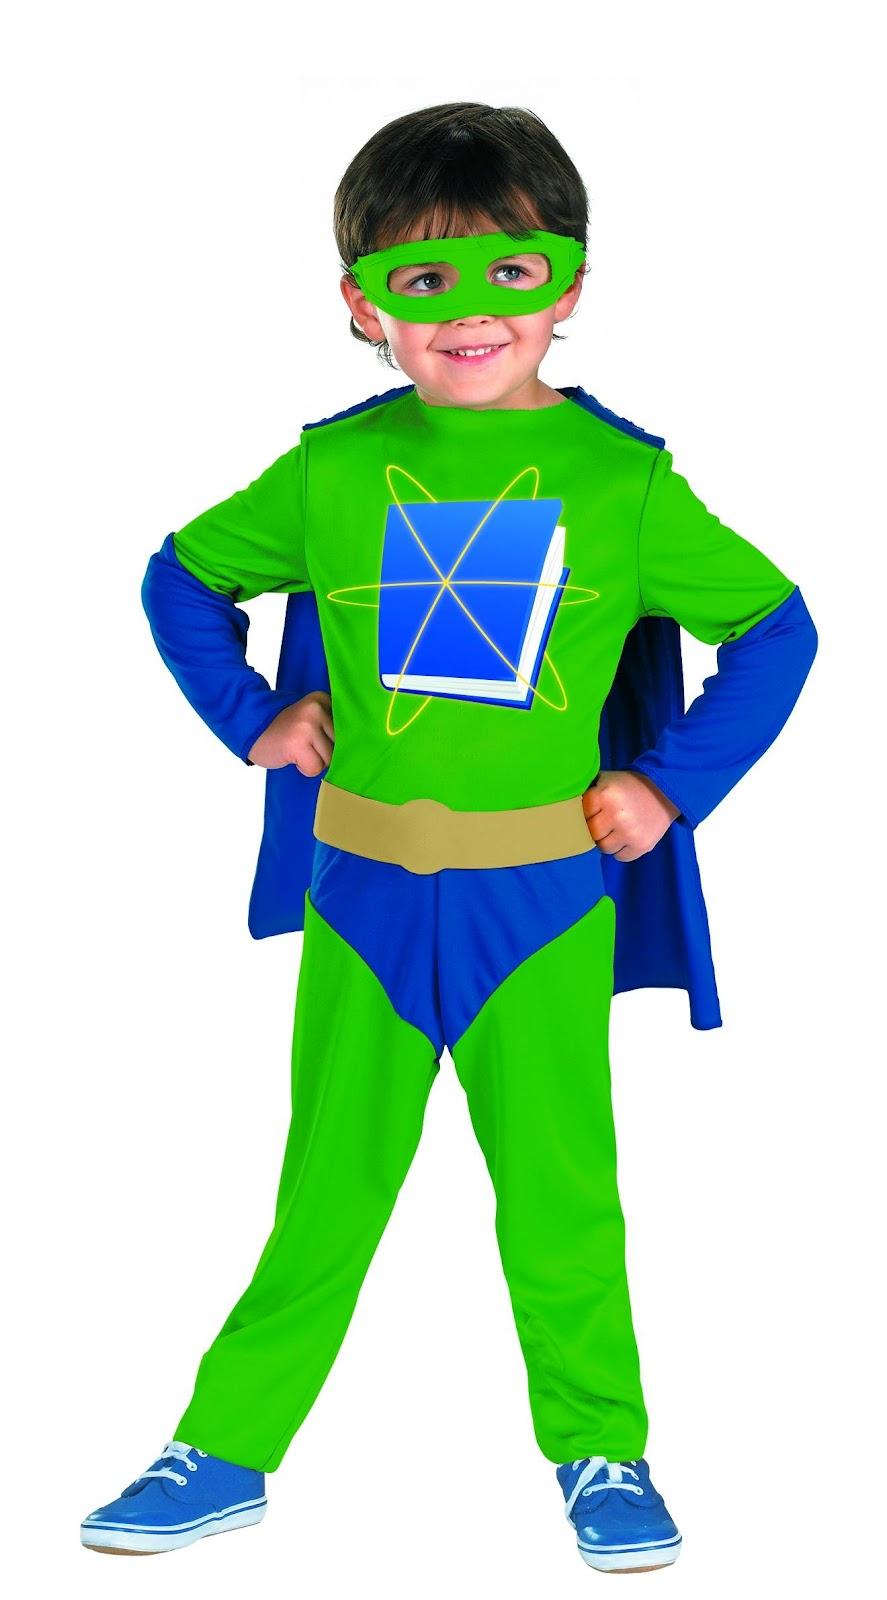 Superhero Costume Ideas for Kids : Let's Celebrate!